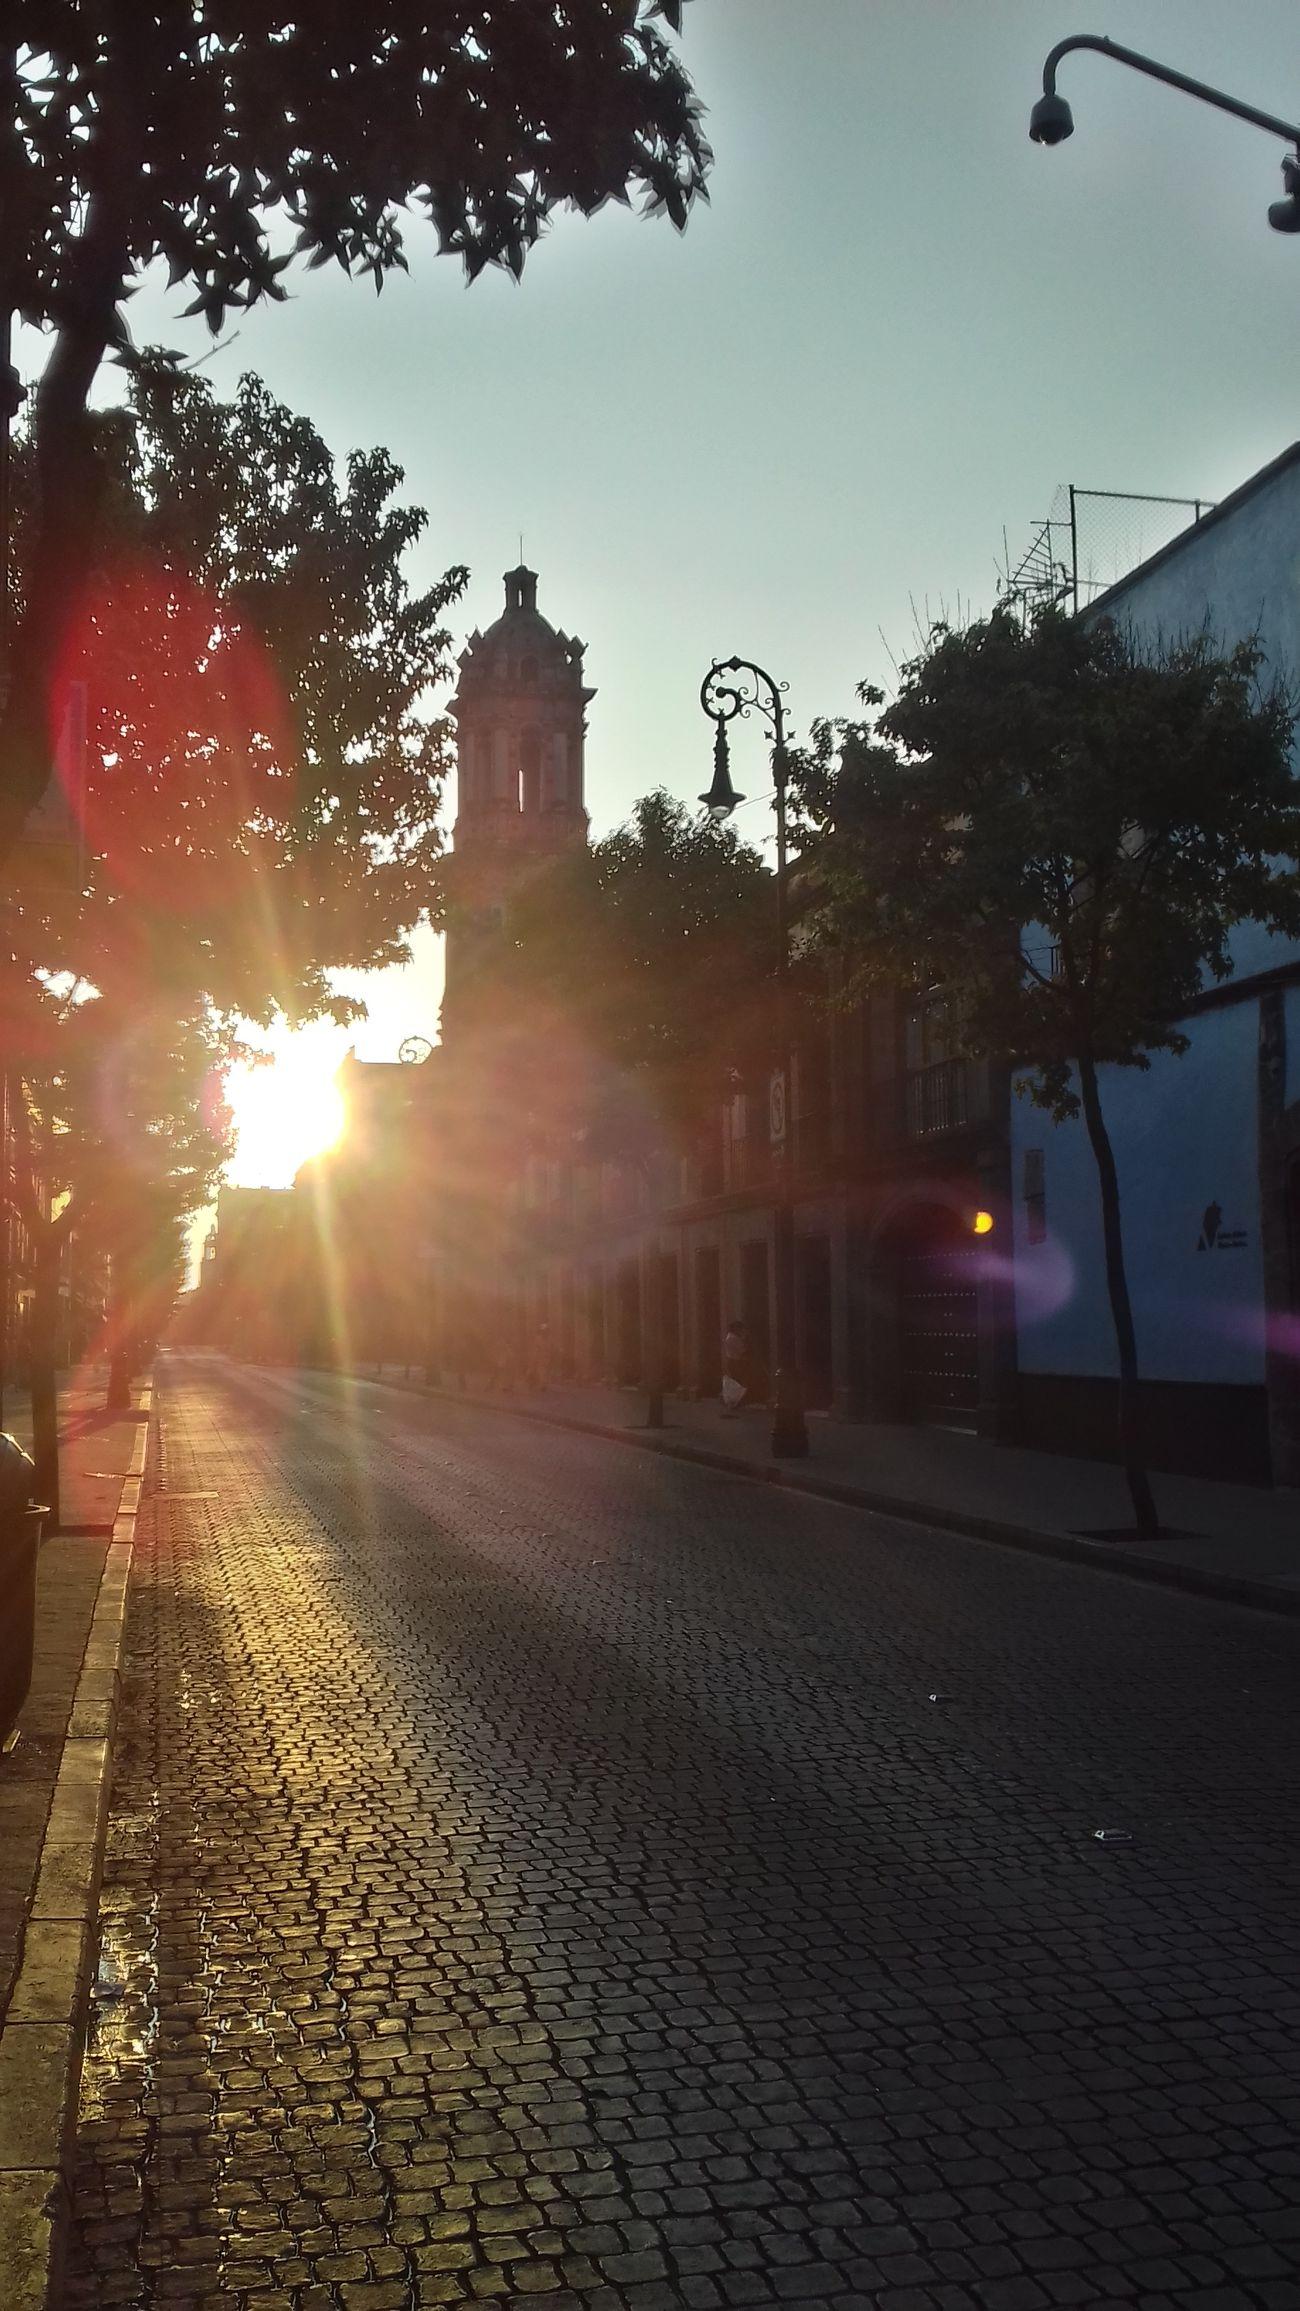 Phone Photography City Street Mexico City Mexico_maravilloso Mexico De Mis Amores Originalpicture City Street My City Is Beautiful Modern